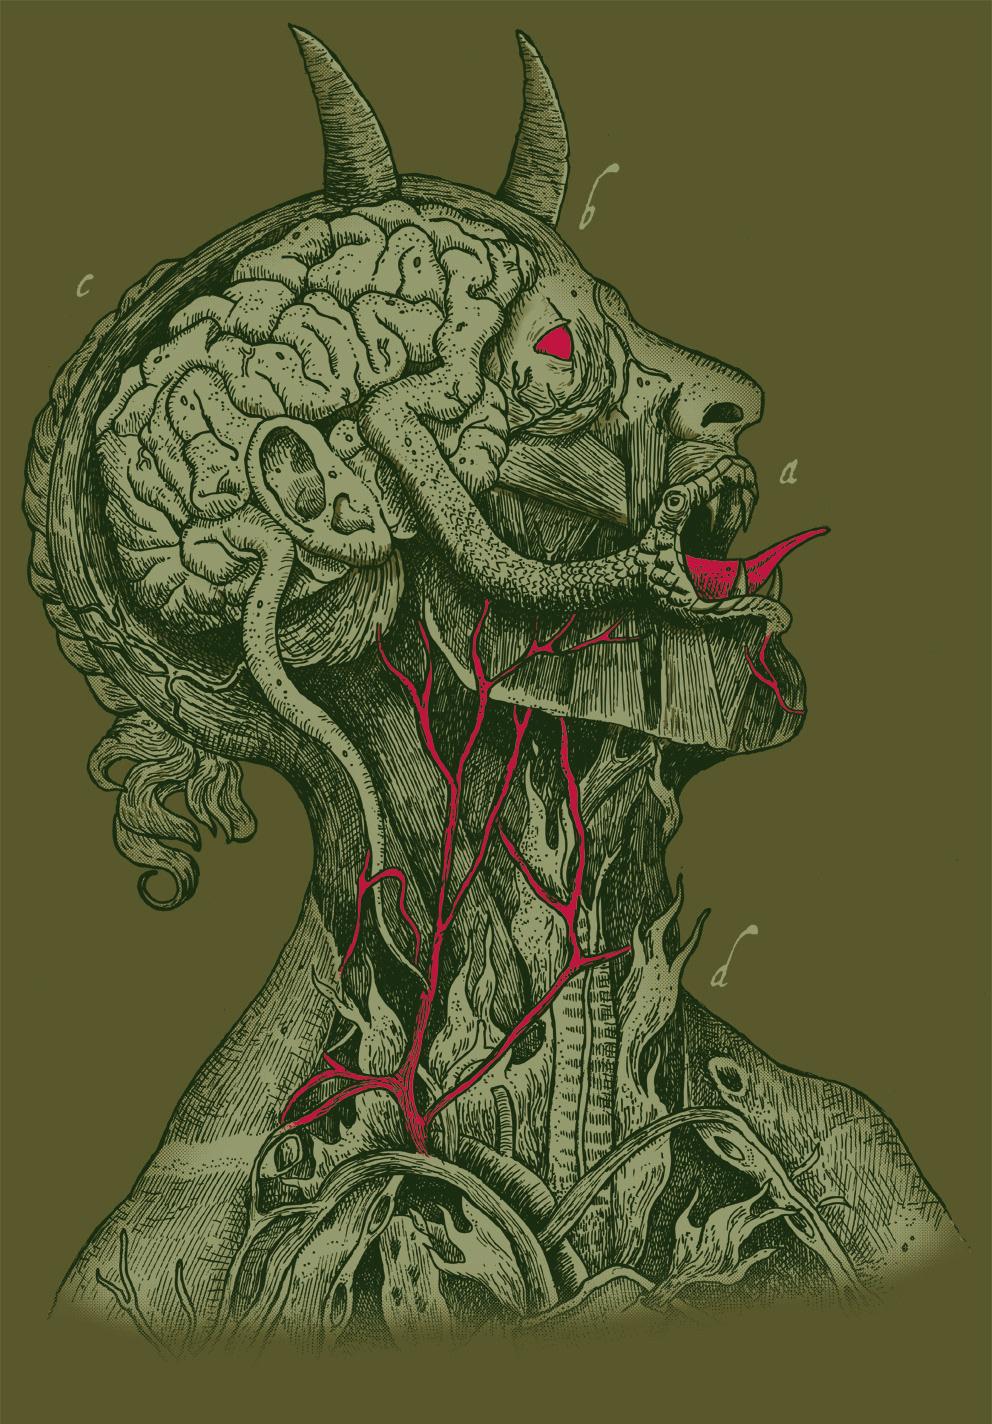 Alvaro Arteaga - Anatomy of Evil